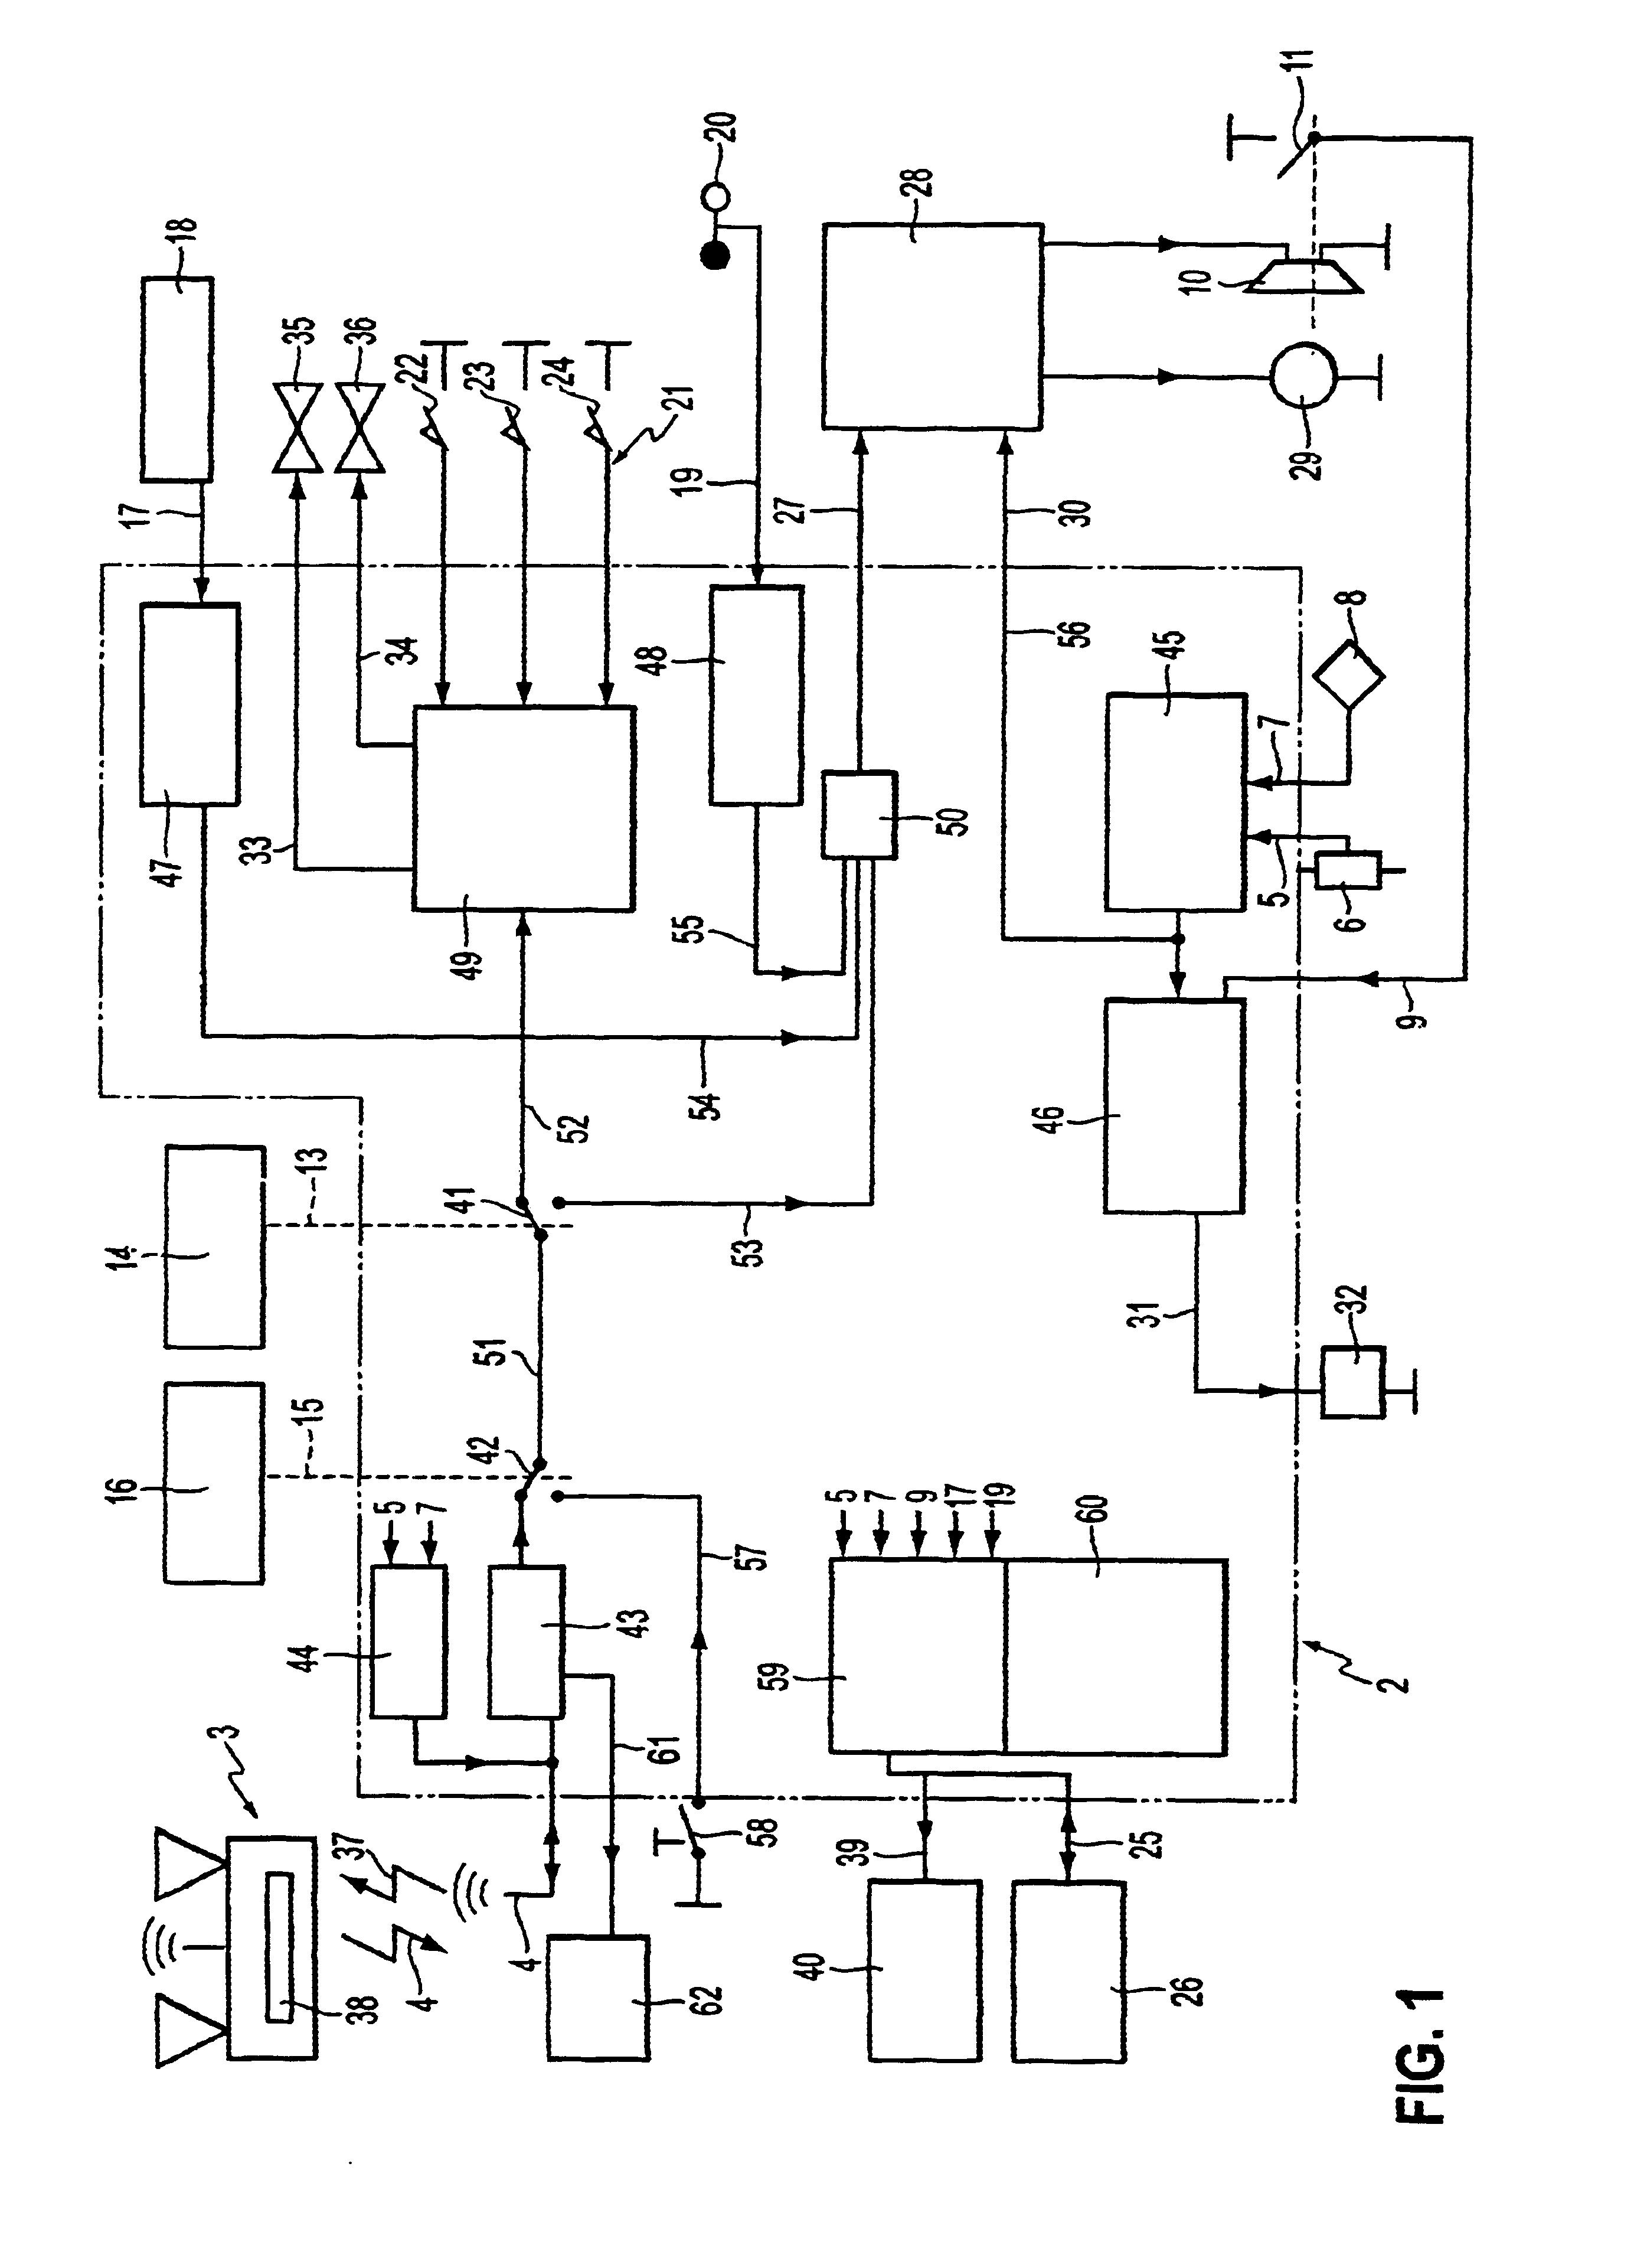 Crane Xr700 Wiring Diagram Schematics Data Diagrams Ignition Fireball Hi 6 Hook Elsalvadorla Electrical